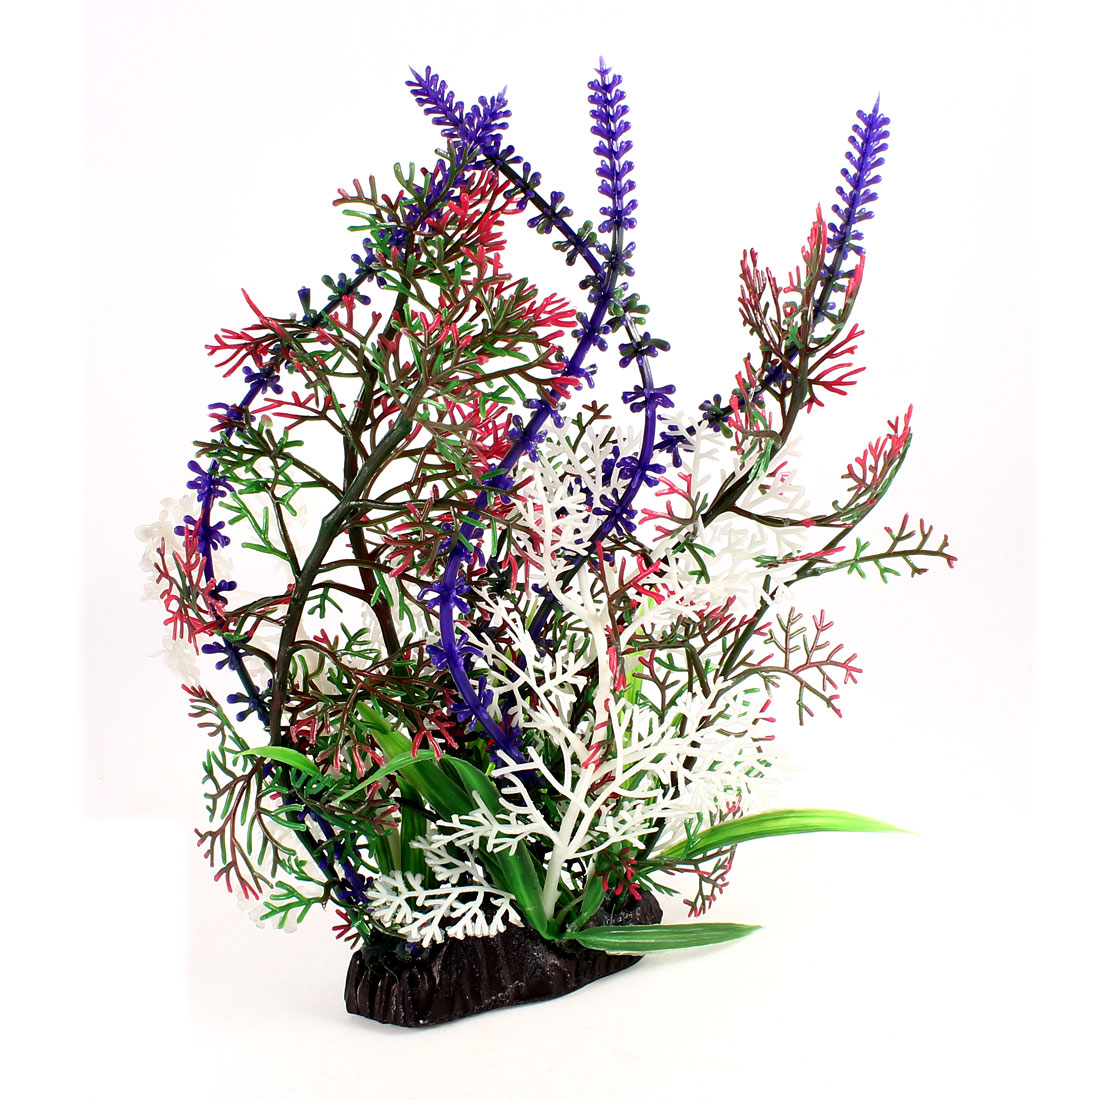 "Artificial Colorful Underwater Grass Plant Fish Tanks Aquarium Ornament 9.1"" High"